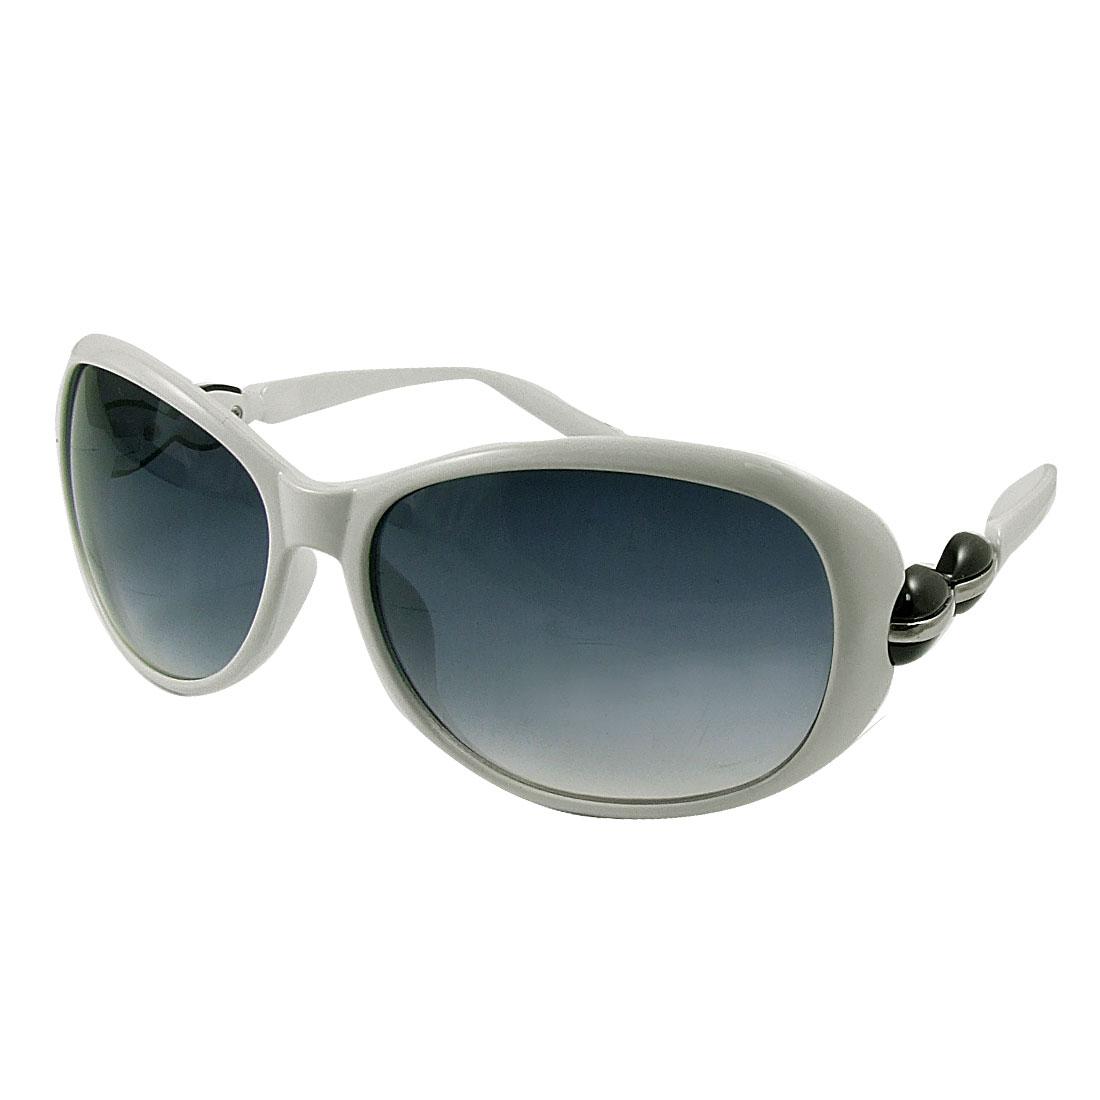 Black Peanut Decor Arm White Full Frame Sunglasses for Woman